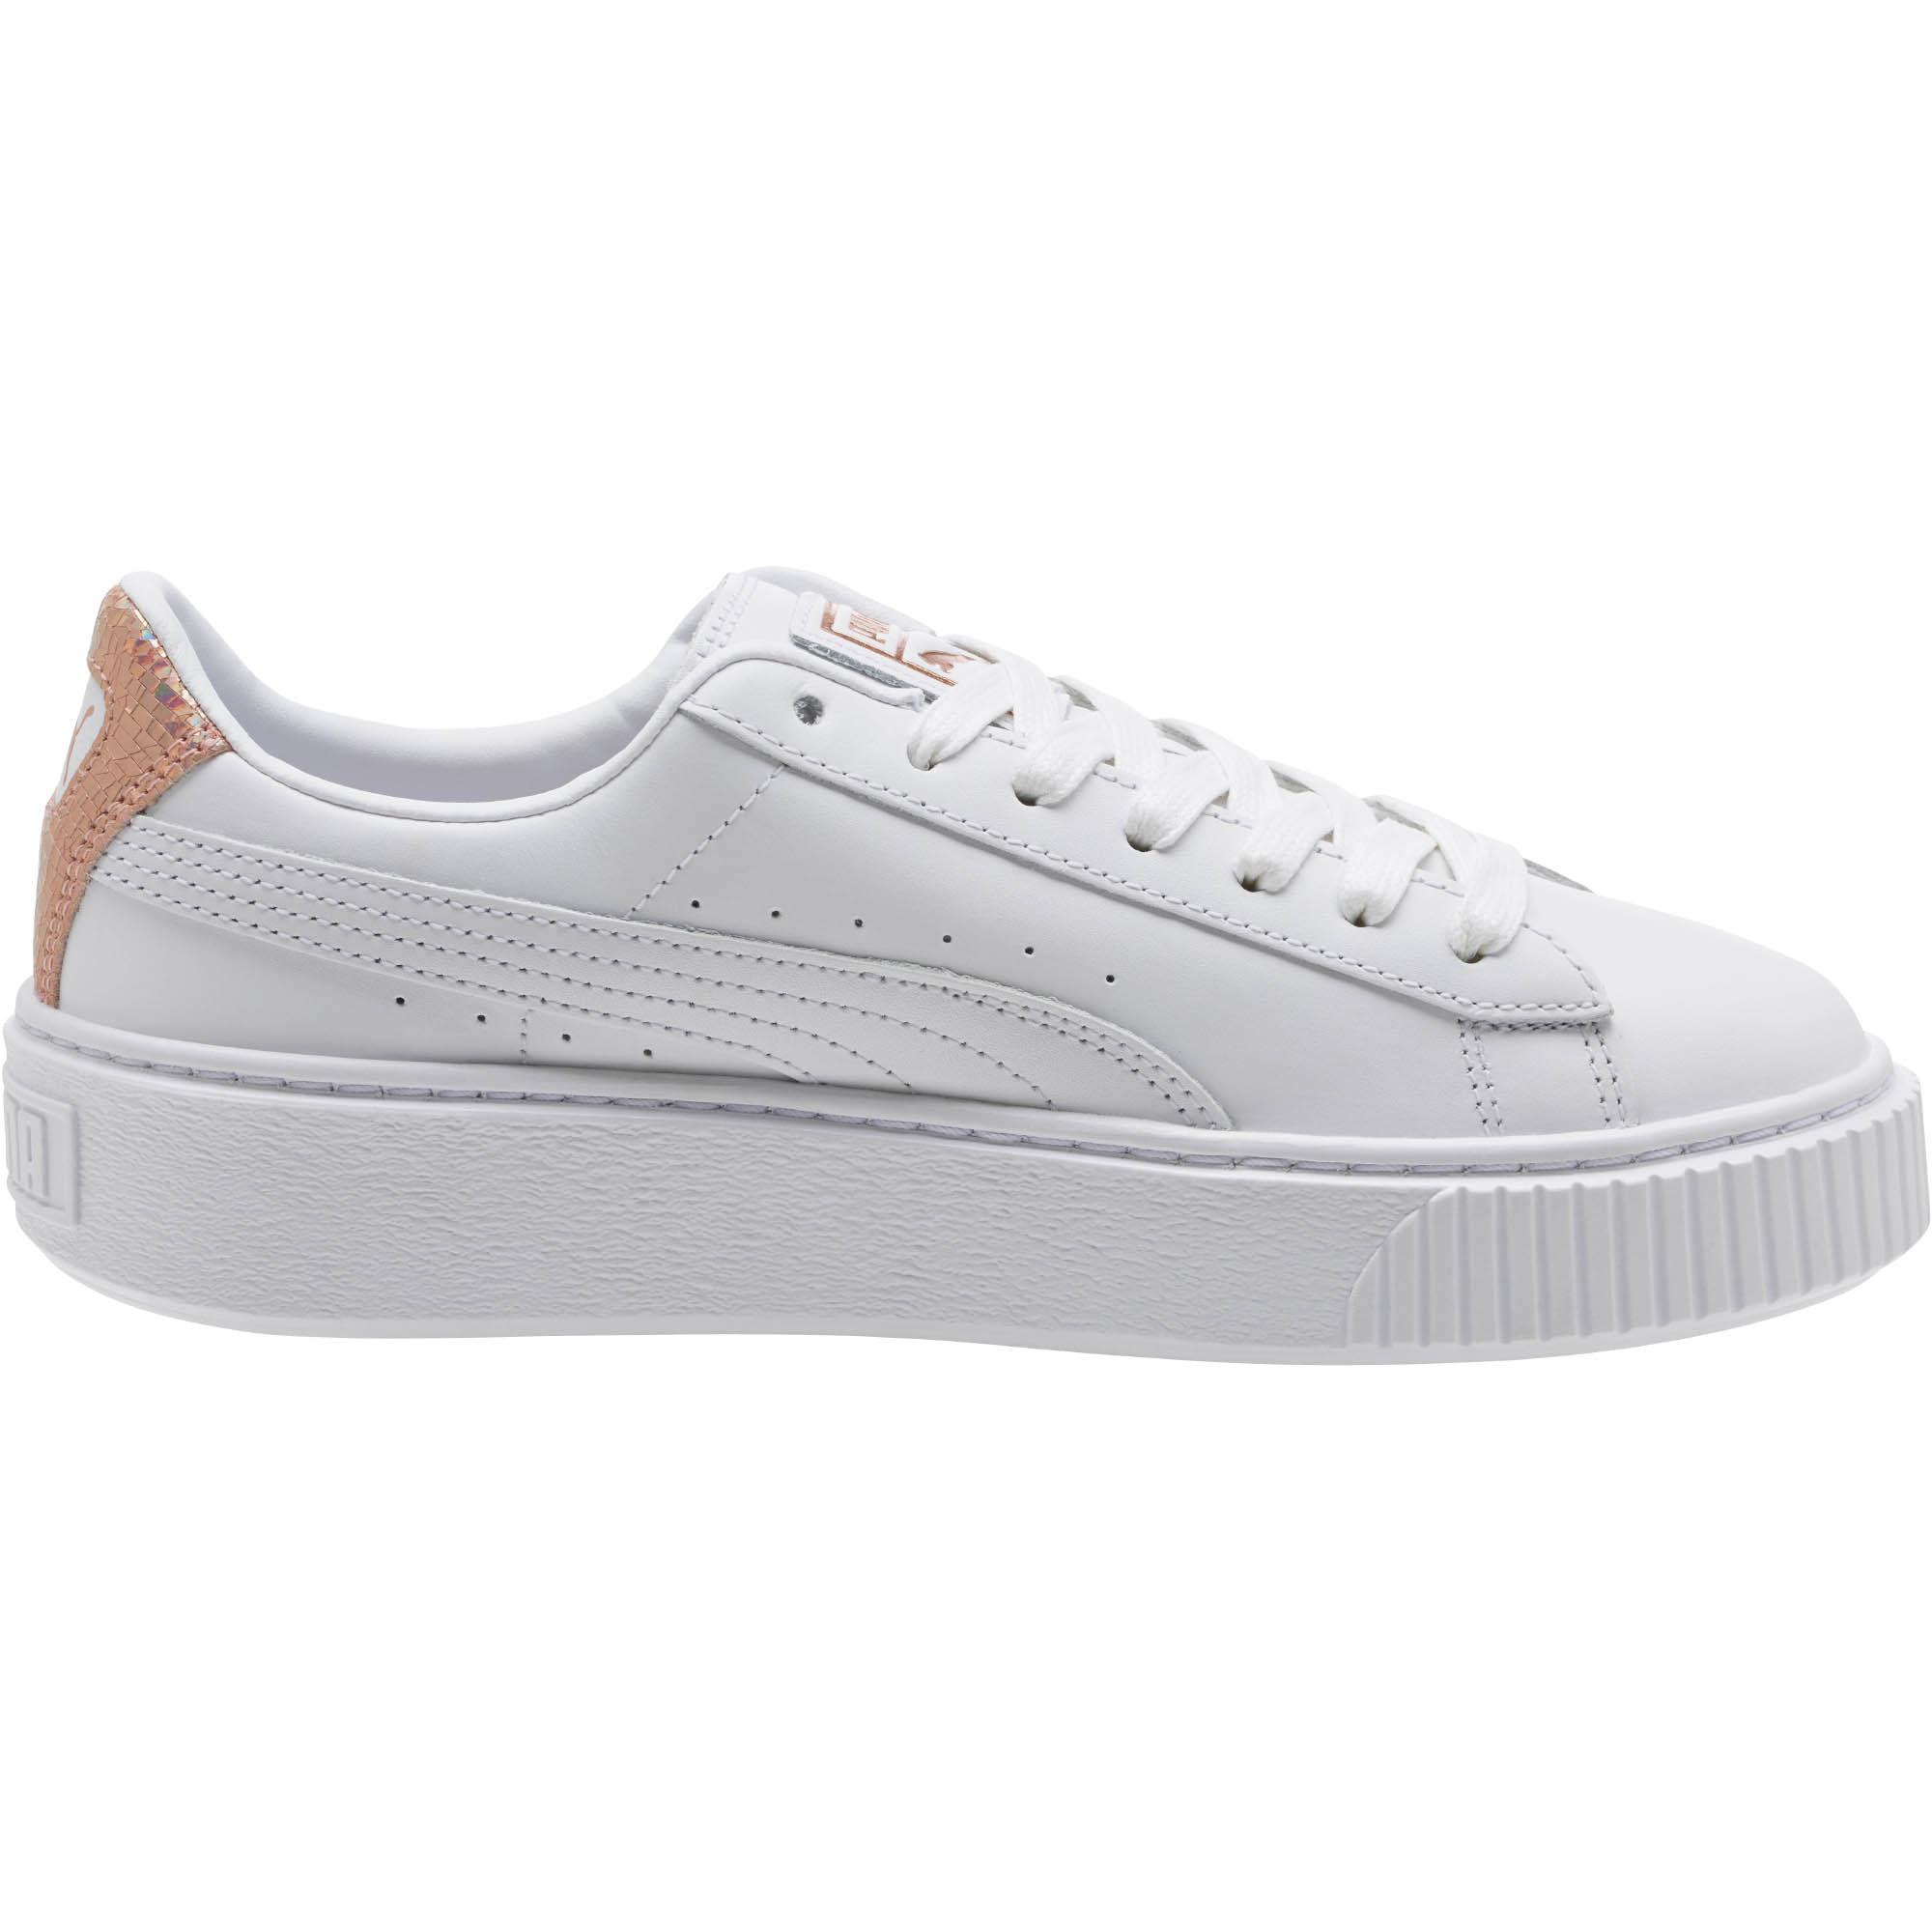 detailed look d5d67 d23d8 Women's Basket Platform Rg ( White/rose Gold) Shoes